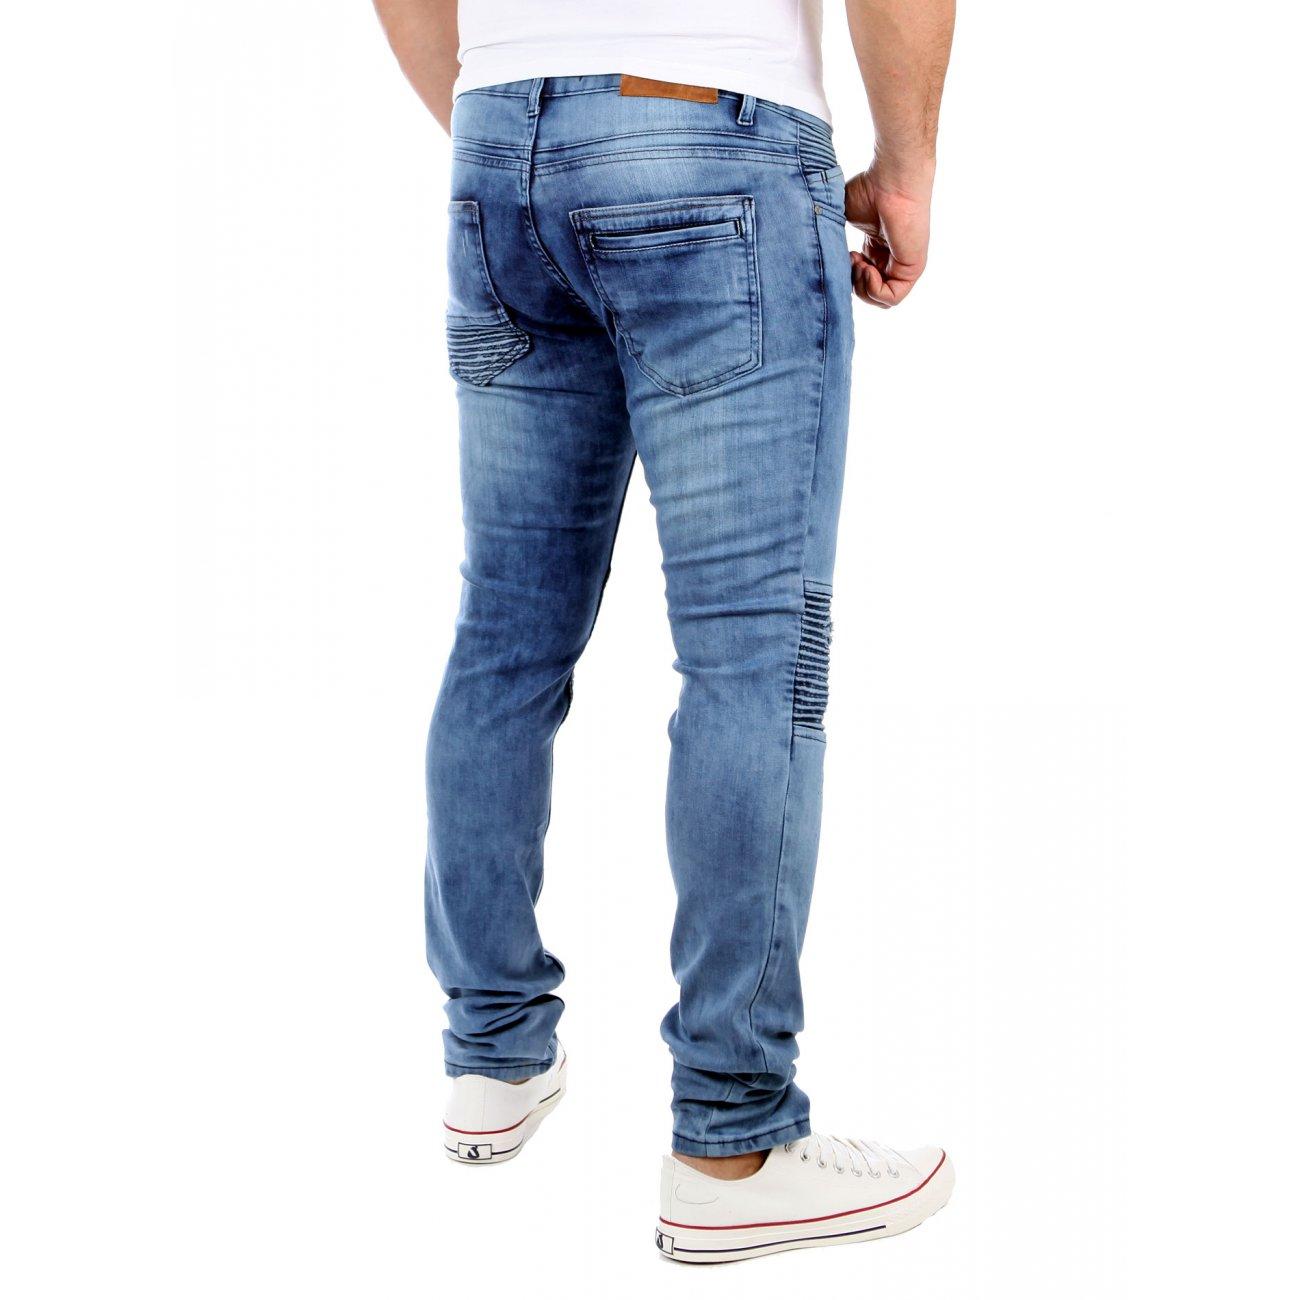 slim jeans herren tazzio strech biker look jeanshose blau. Black Bedroom Furniture Sets. Home Design Ideas